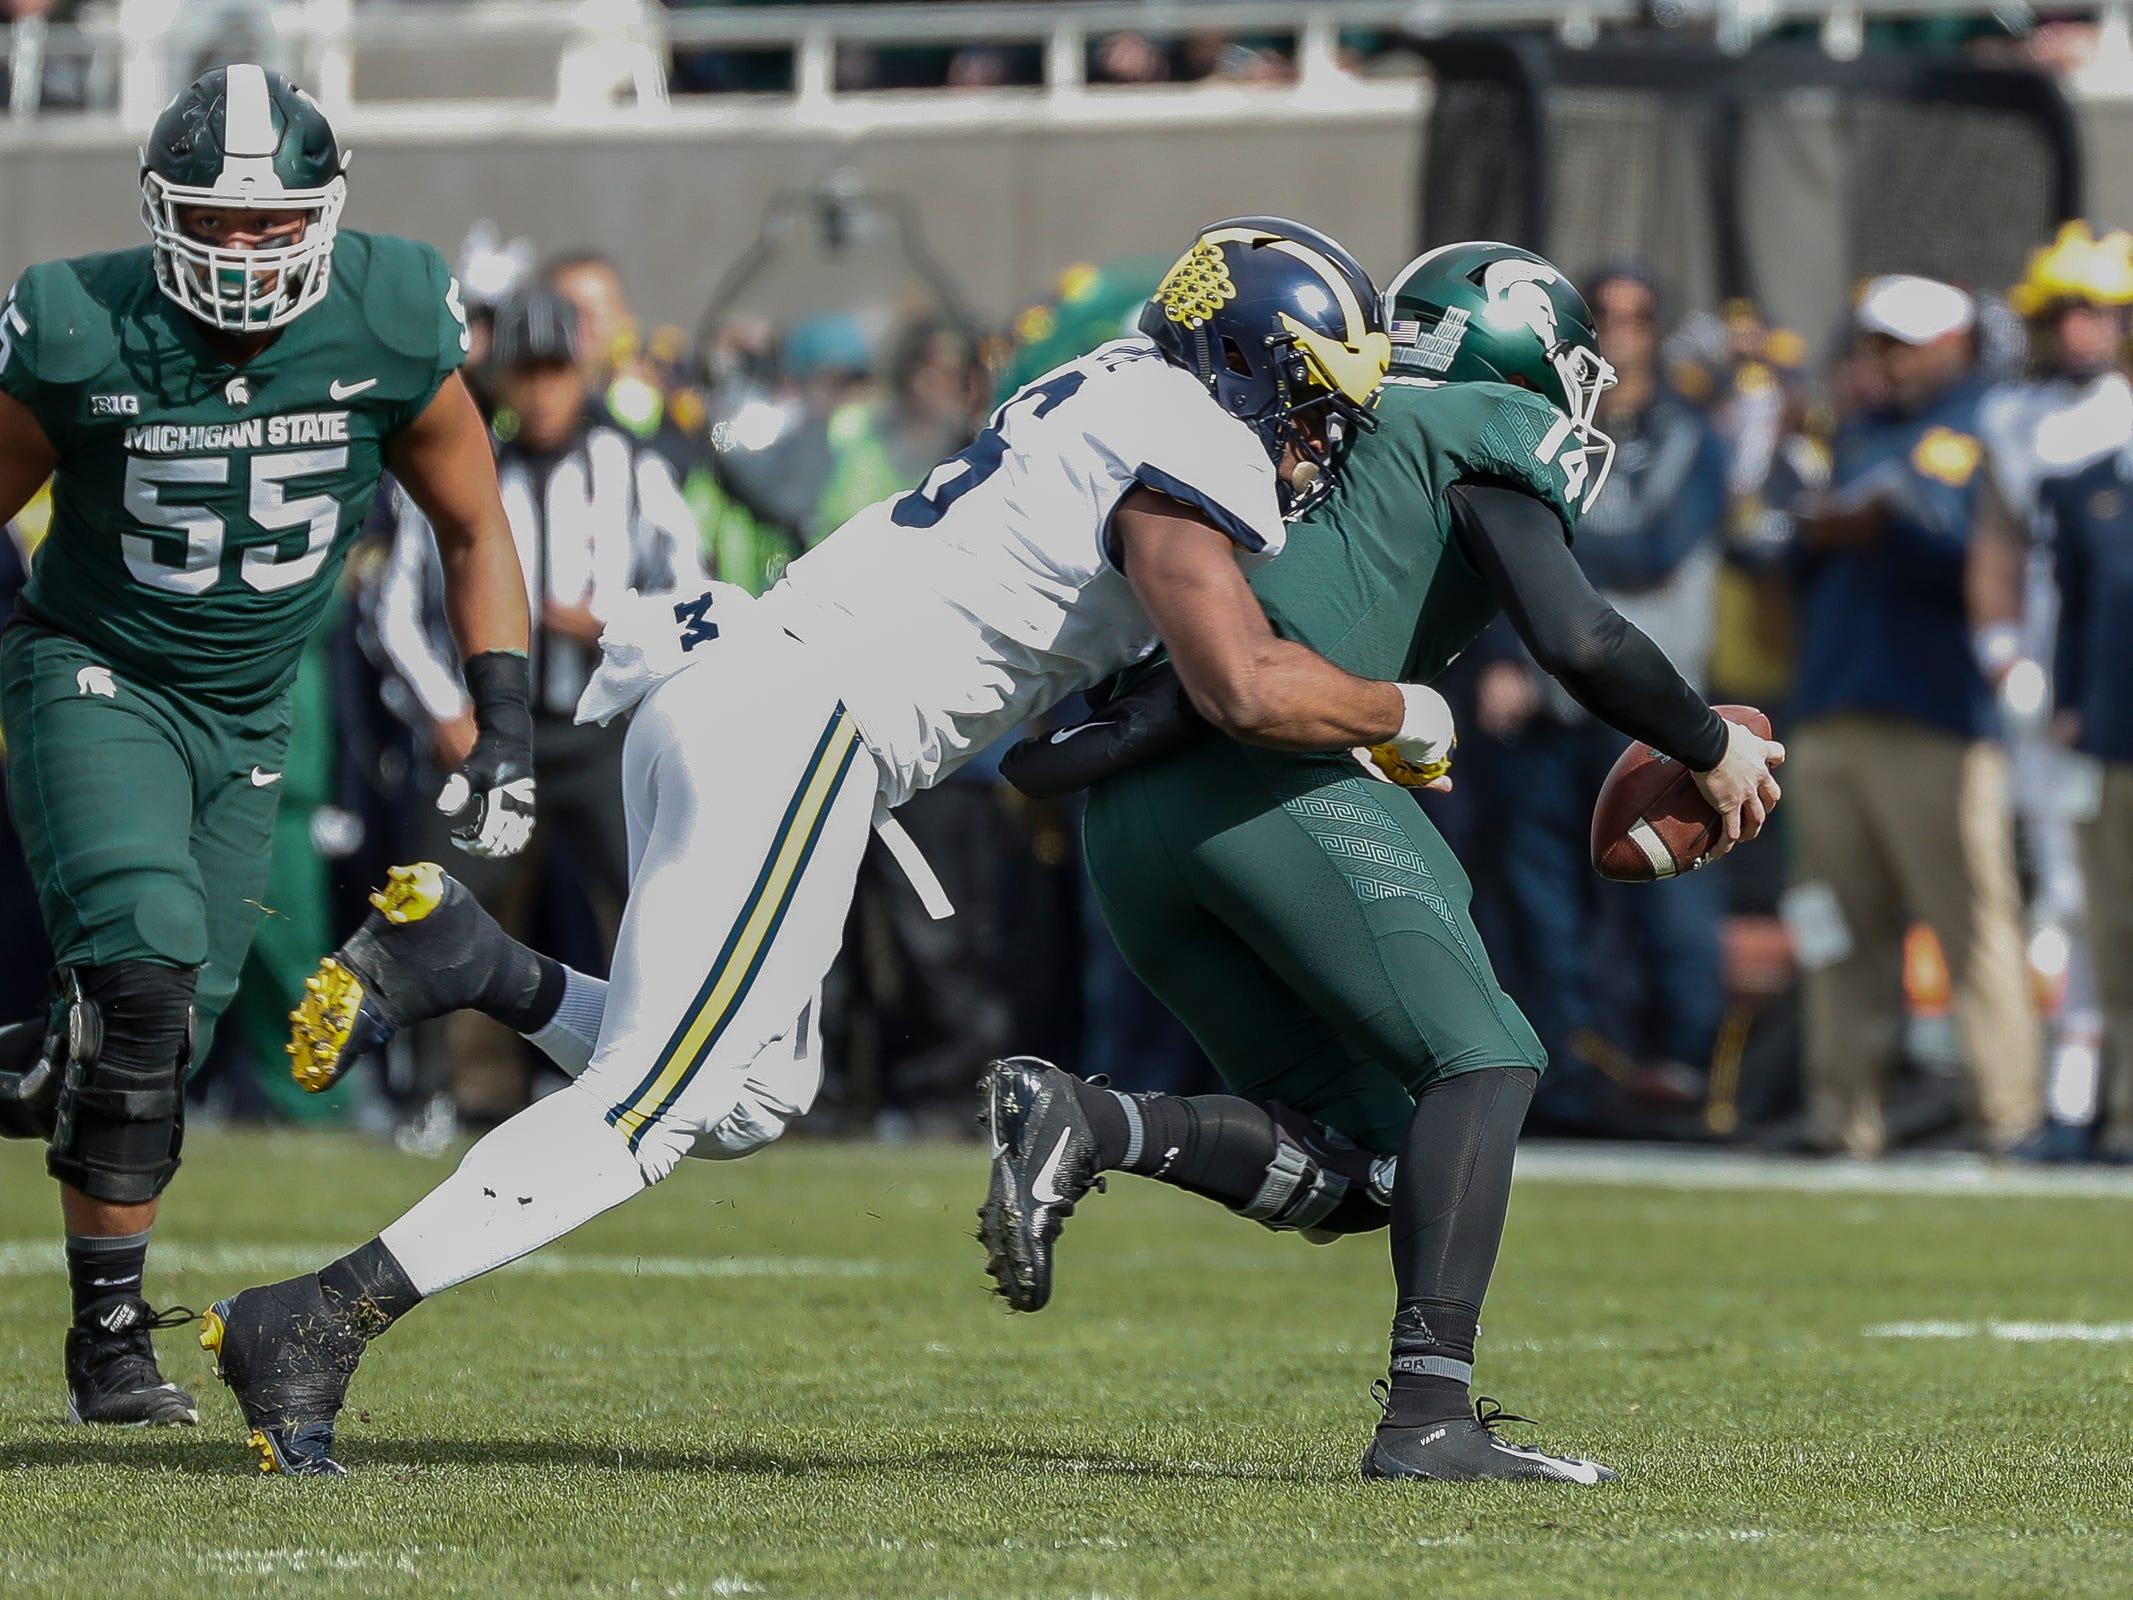 Michigan linebacker Josh Uche sacks Michigan State quarterback Brian Lewerke during the first half at Spartan Stadium on Saturday, Oct. 20, 2018.